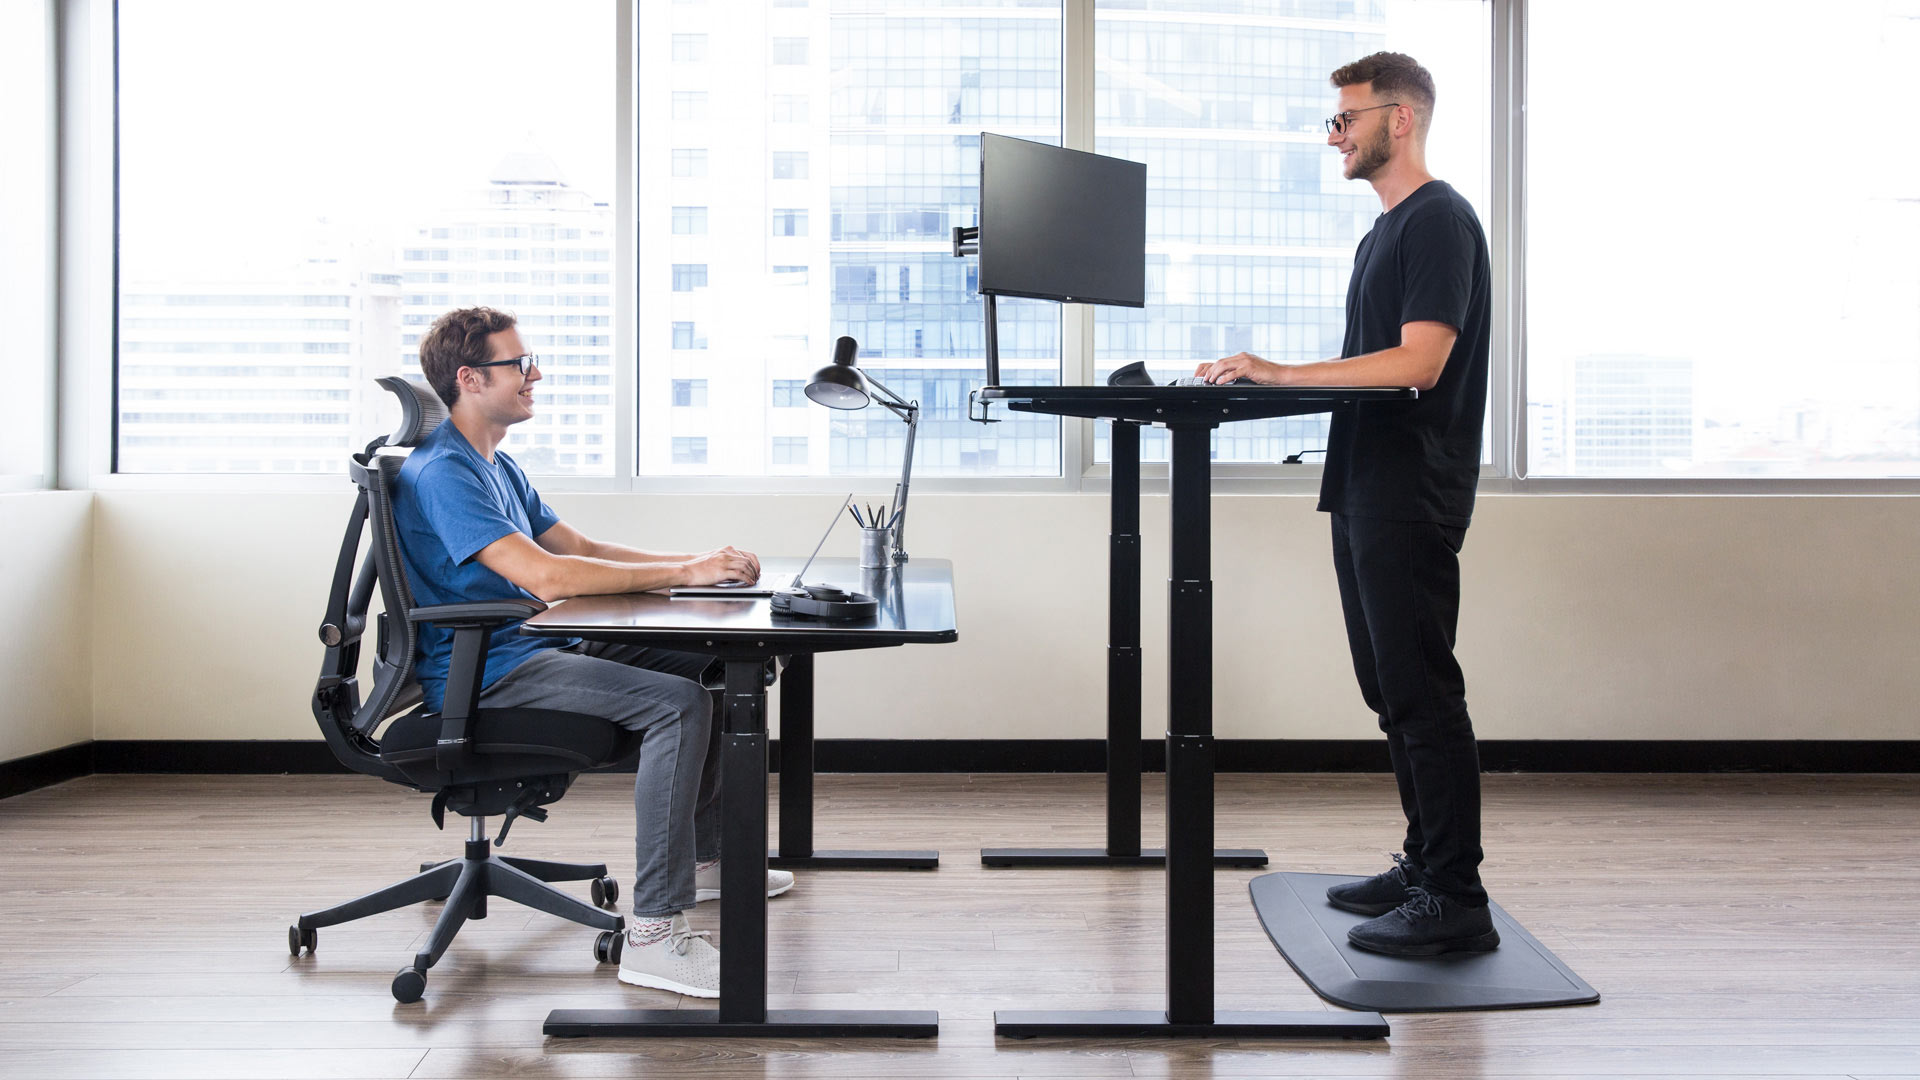 5 Reasons to Choose the Autonomous Standing Desk Black Friday 2018 - Image 2